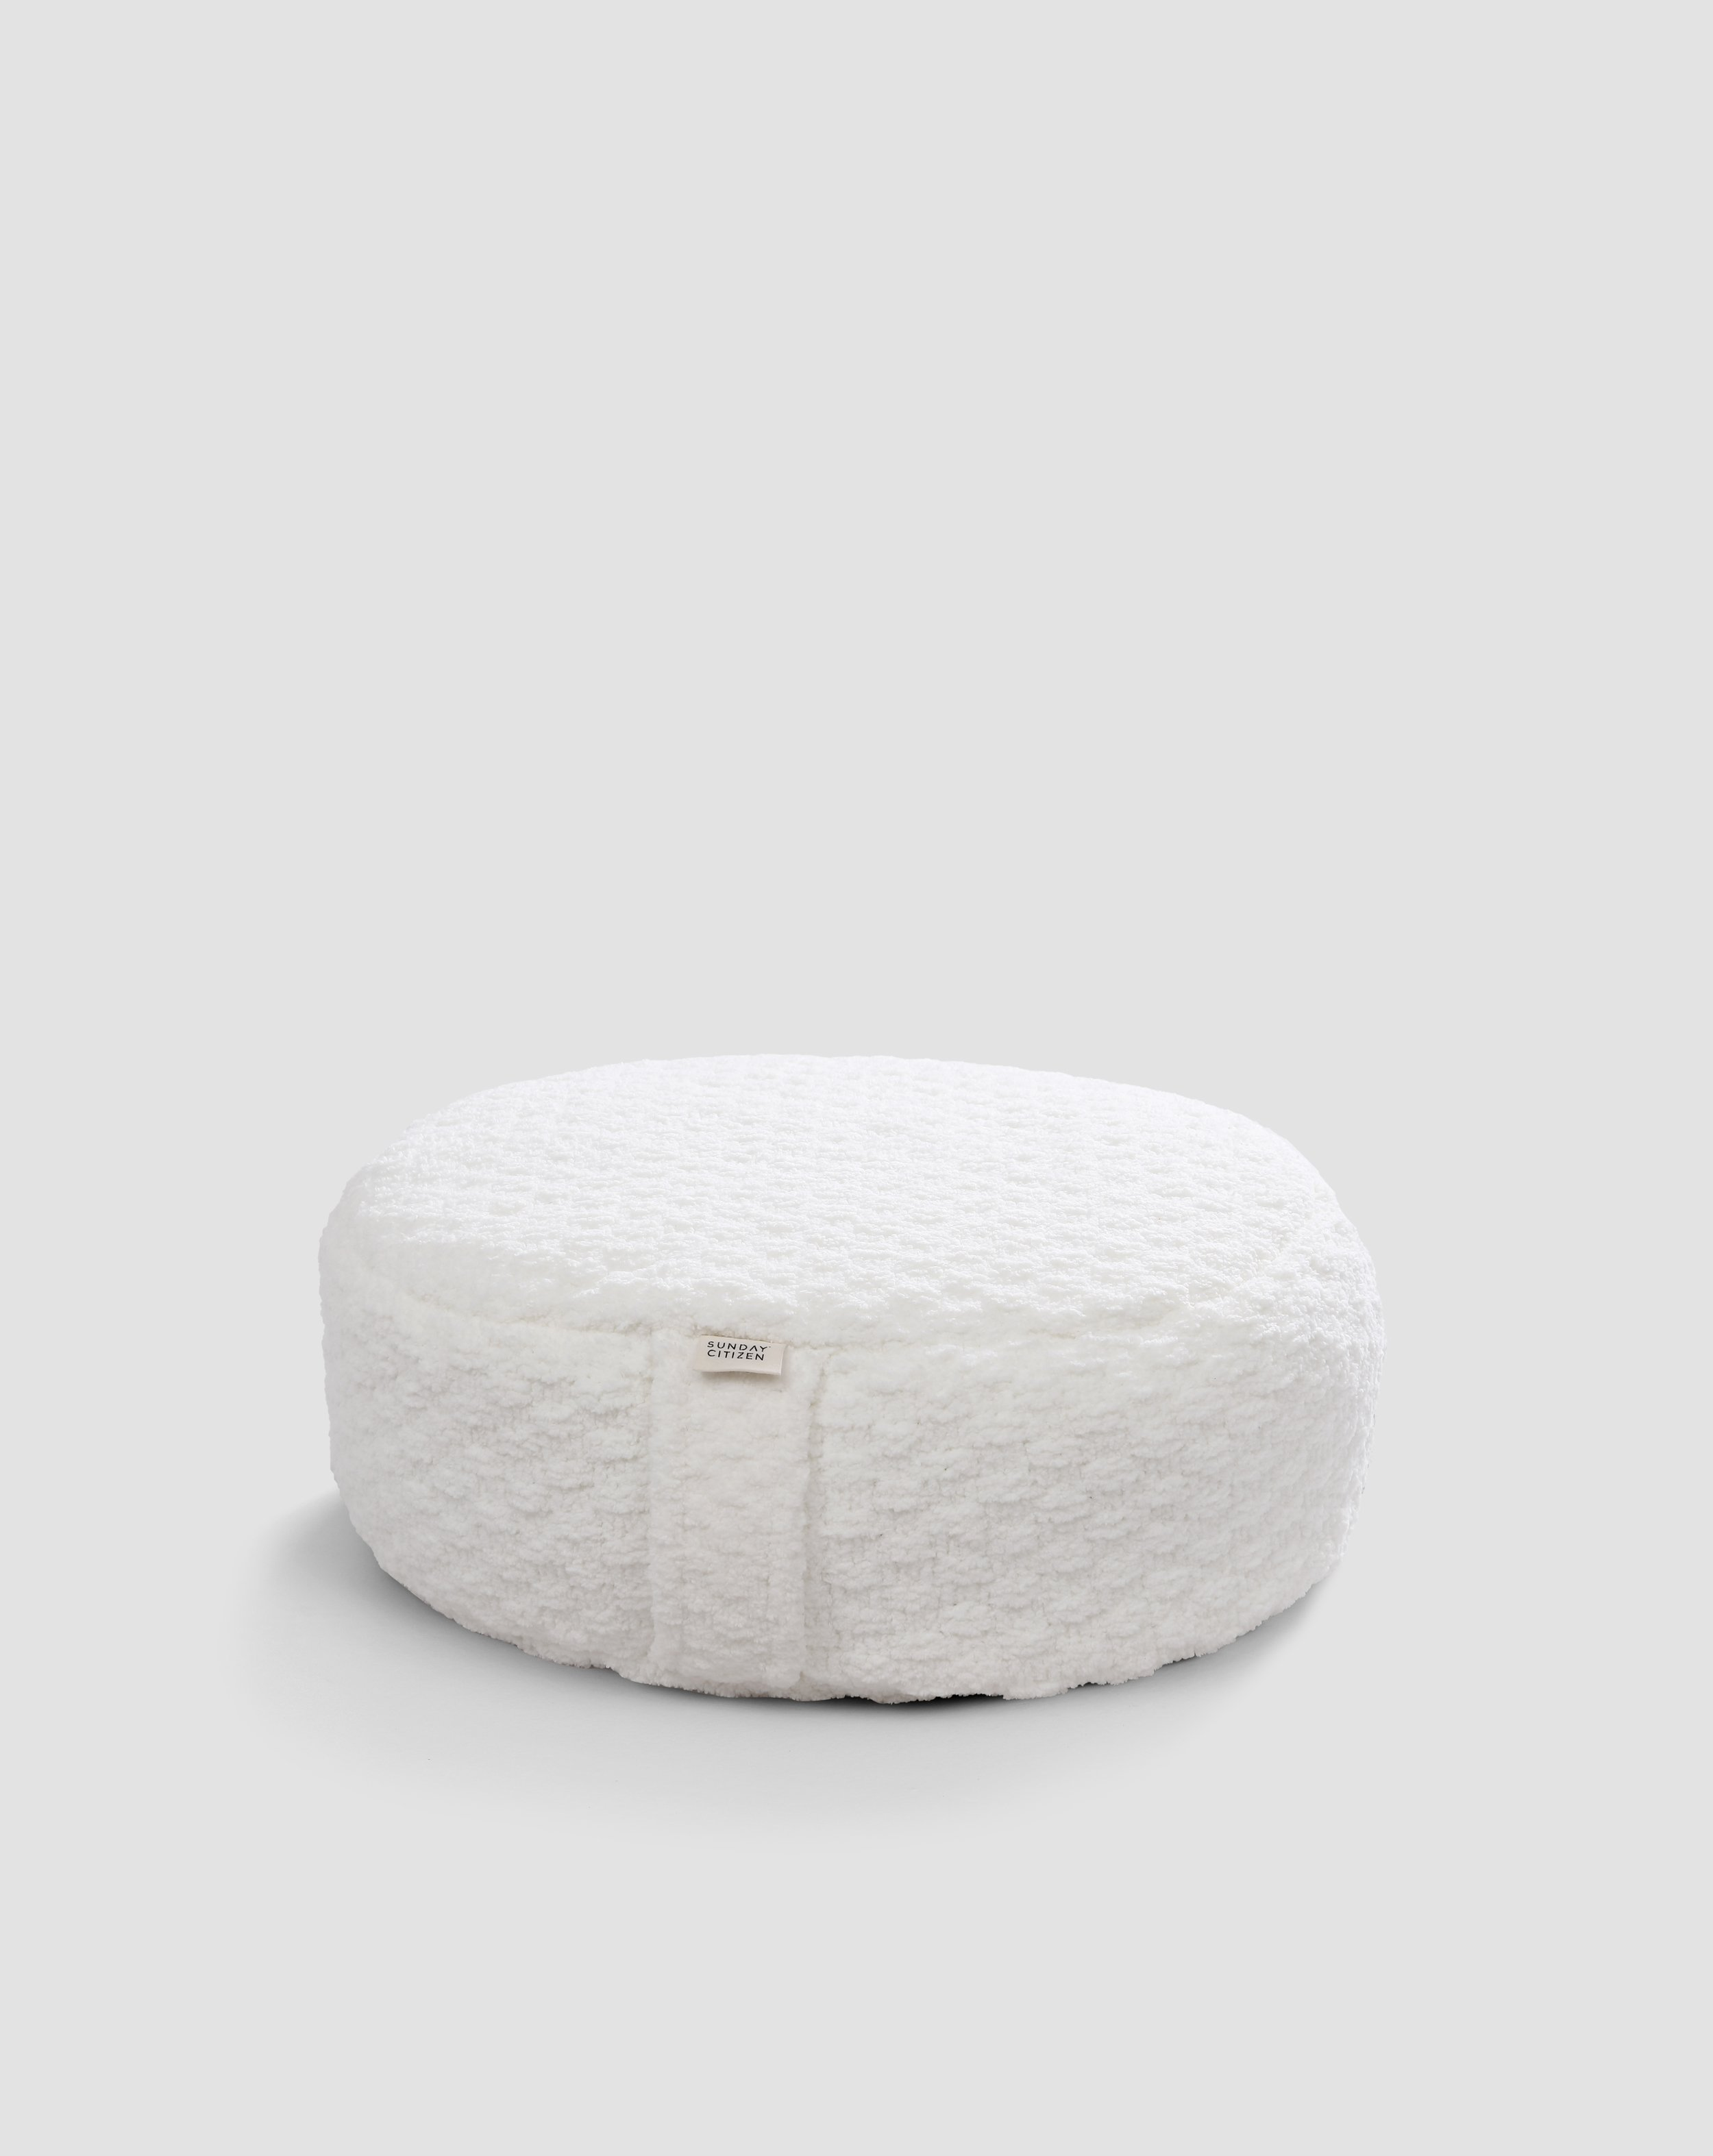 Crystal Meditation Pillow